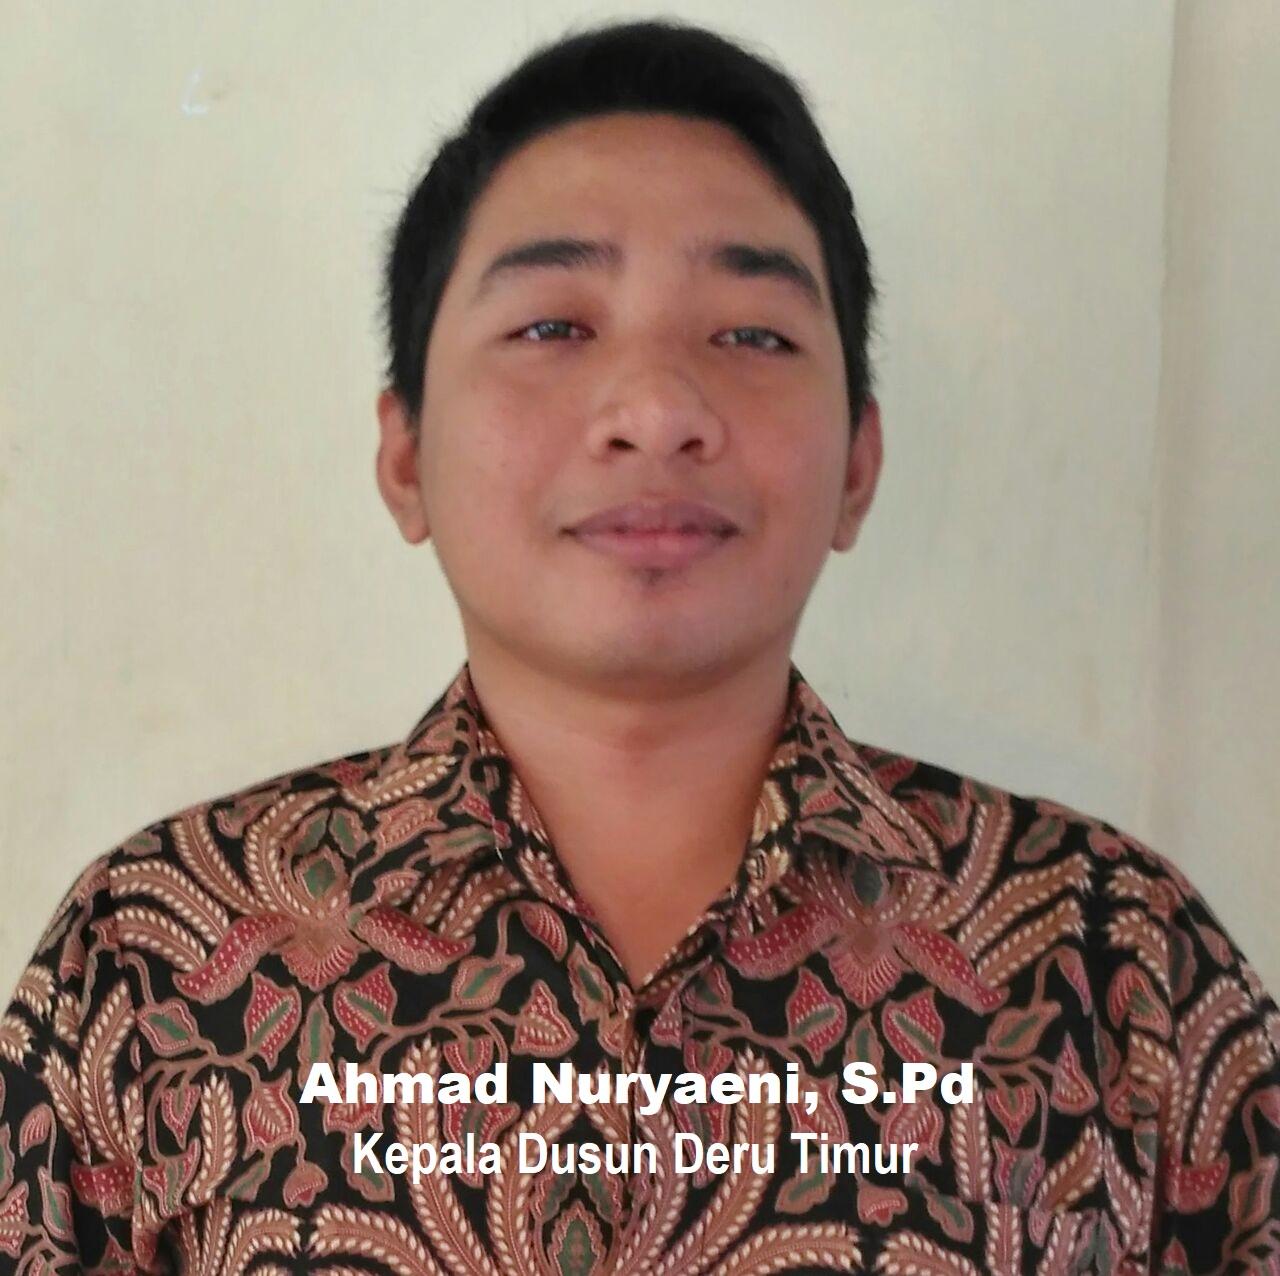 Kepala Dusun Deru Timur